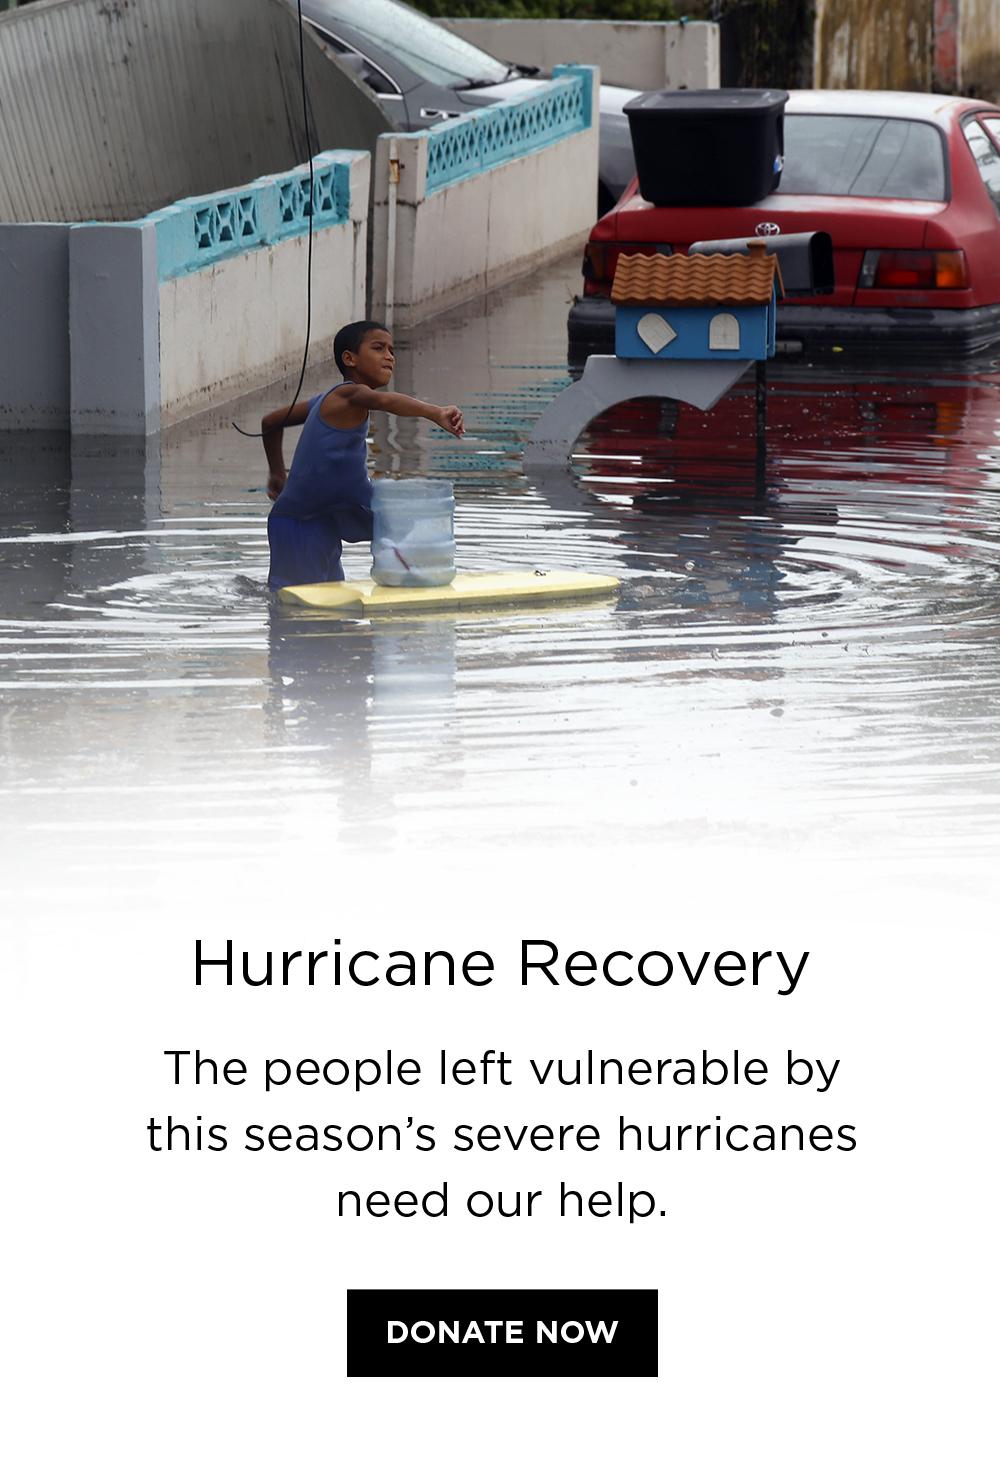 hurricane recovery 2017